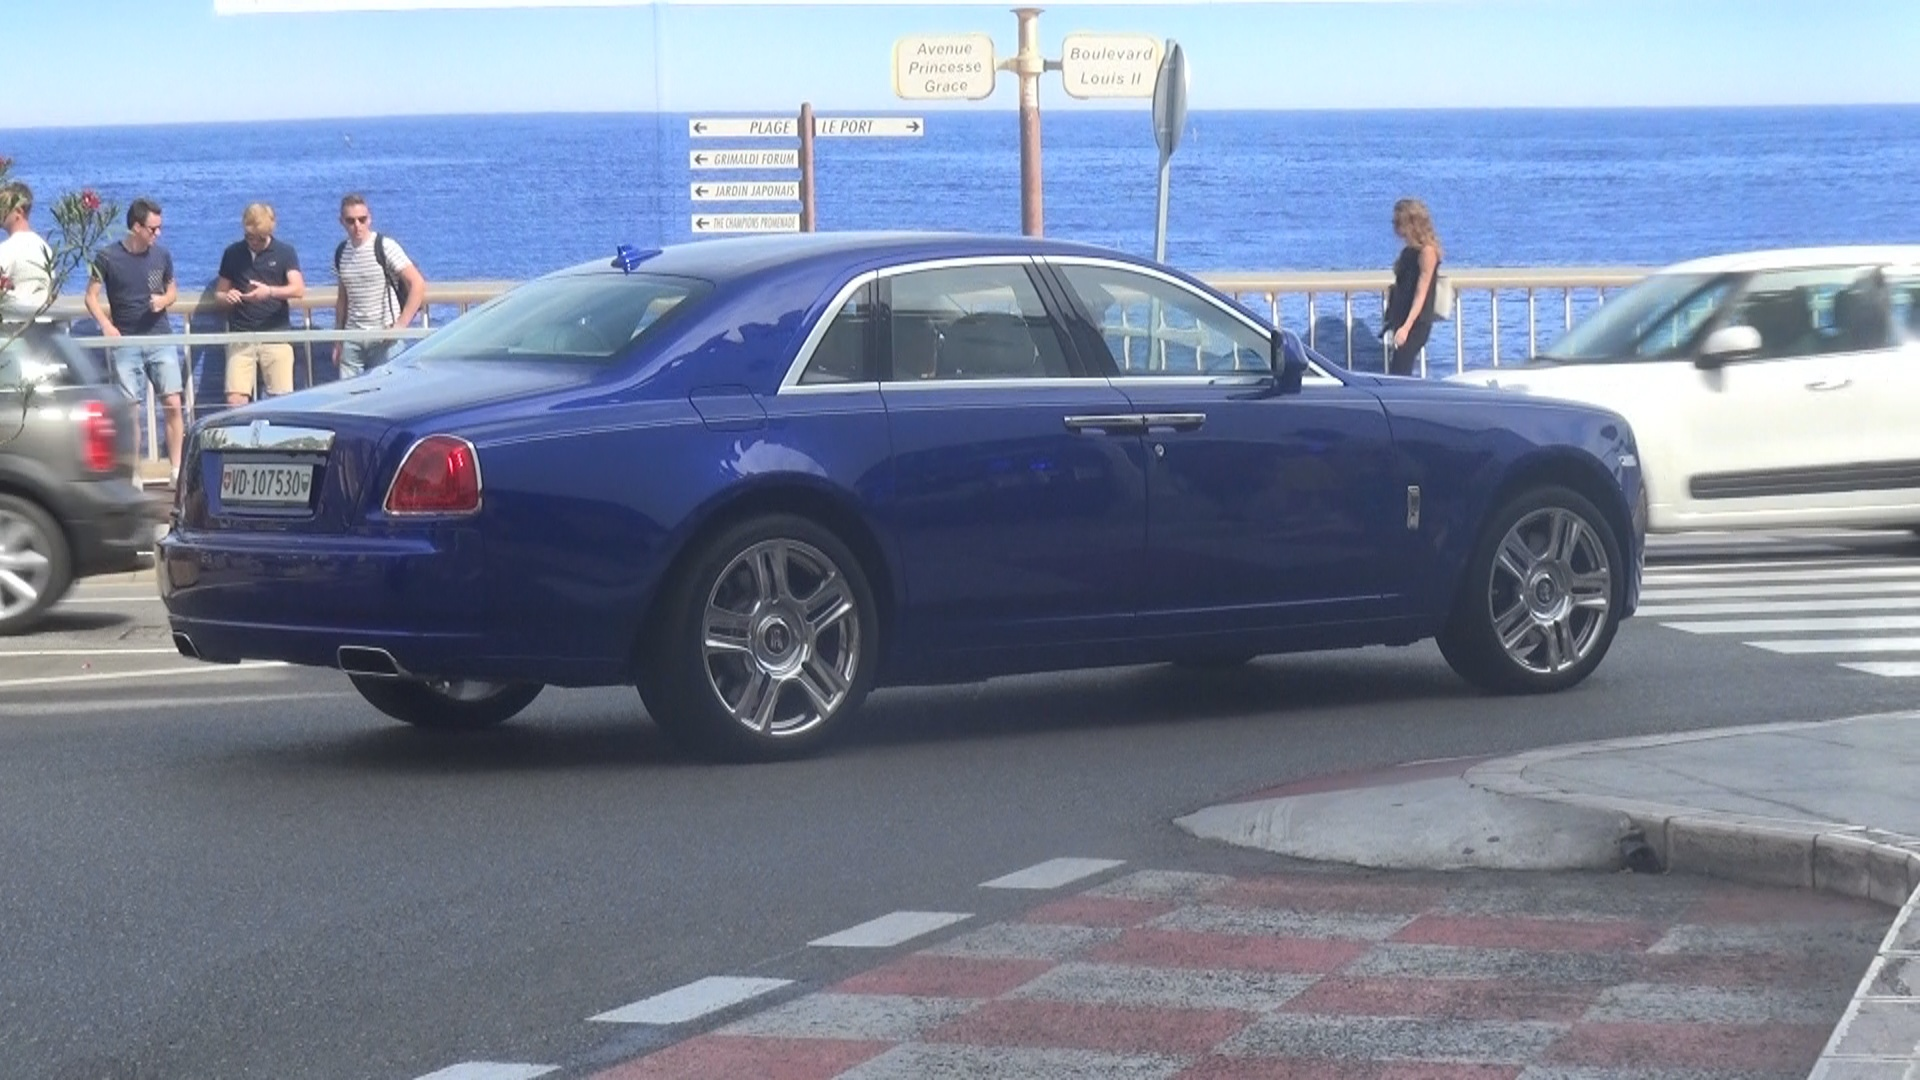 Rolls Royce Ghost - VD-107530 (CH)